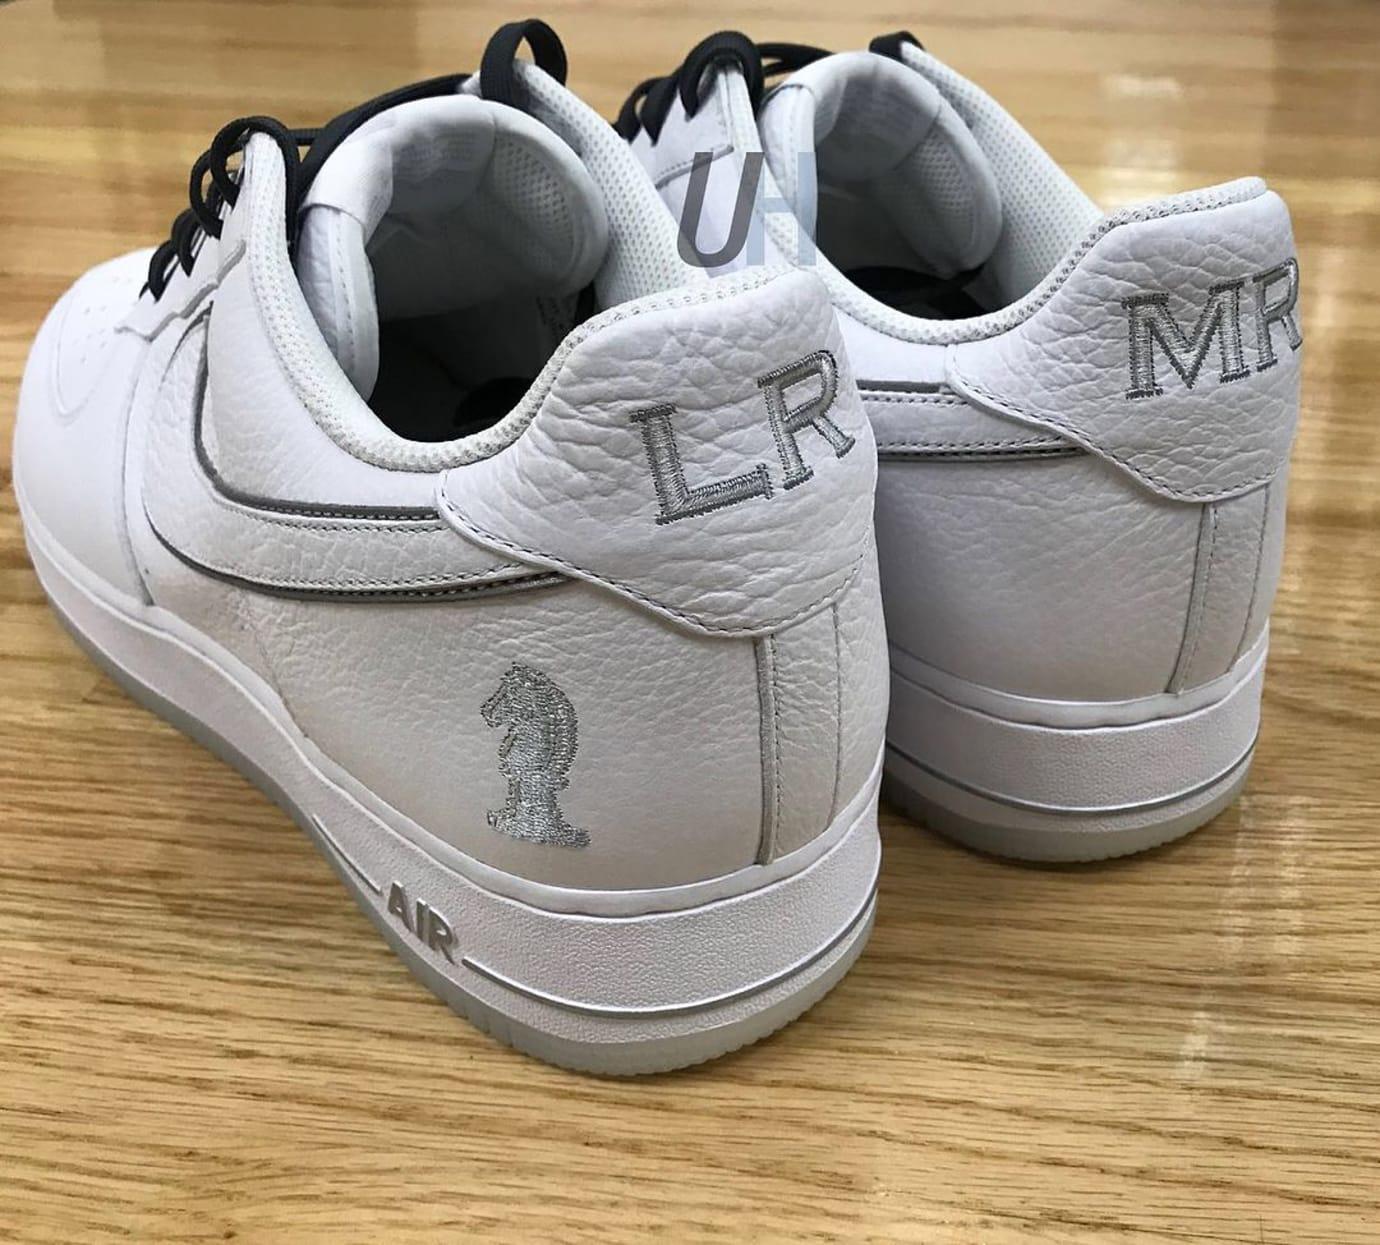 146e0de786e76 Nike Air Force 1 Low LeBron James 4 Horsemen Heel